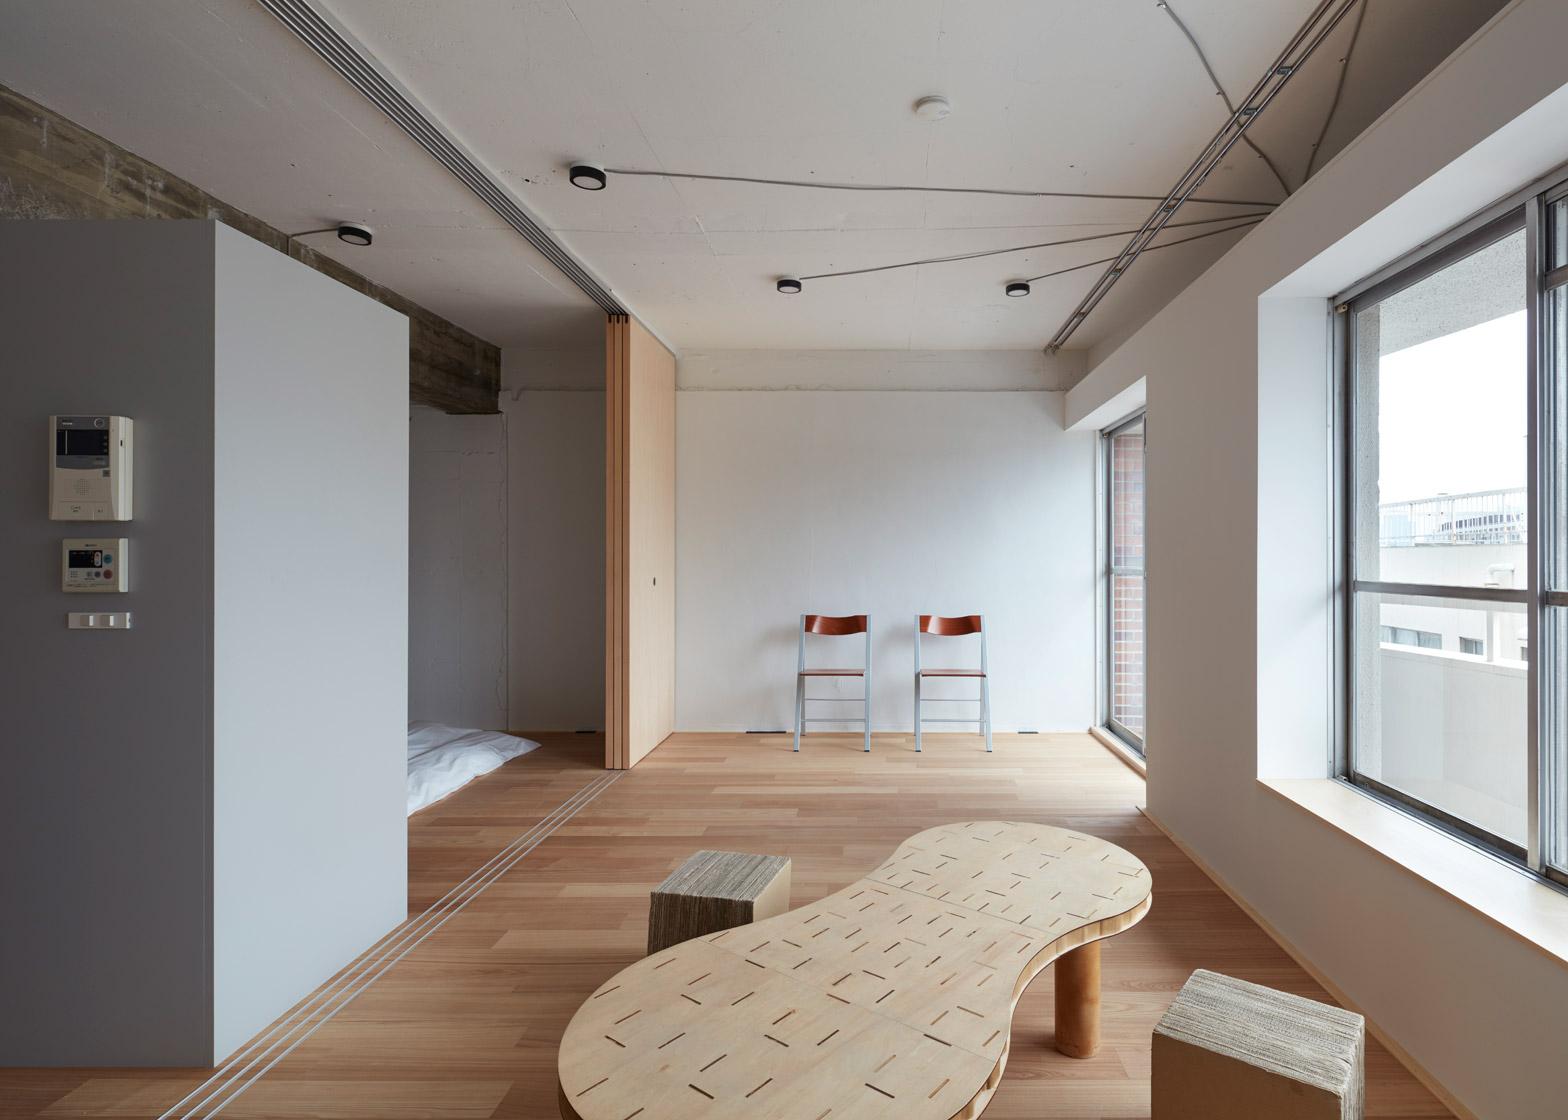 Apartment interior by Frontofficetokyo in Akasaka, Tokyo